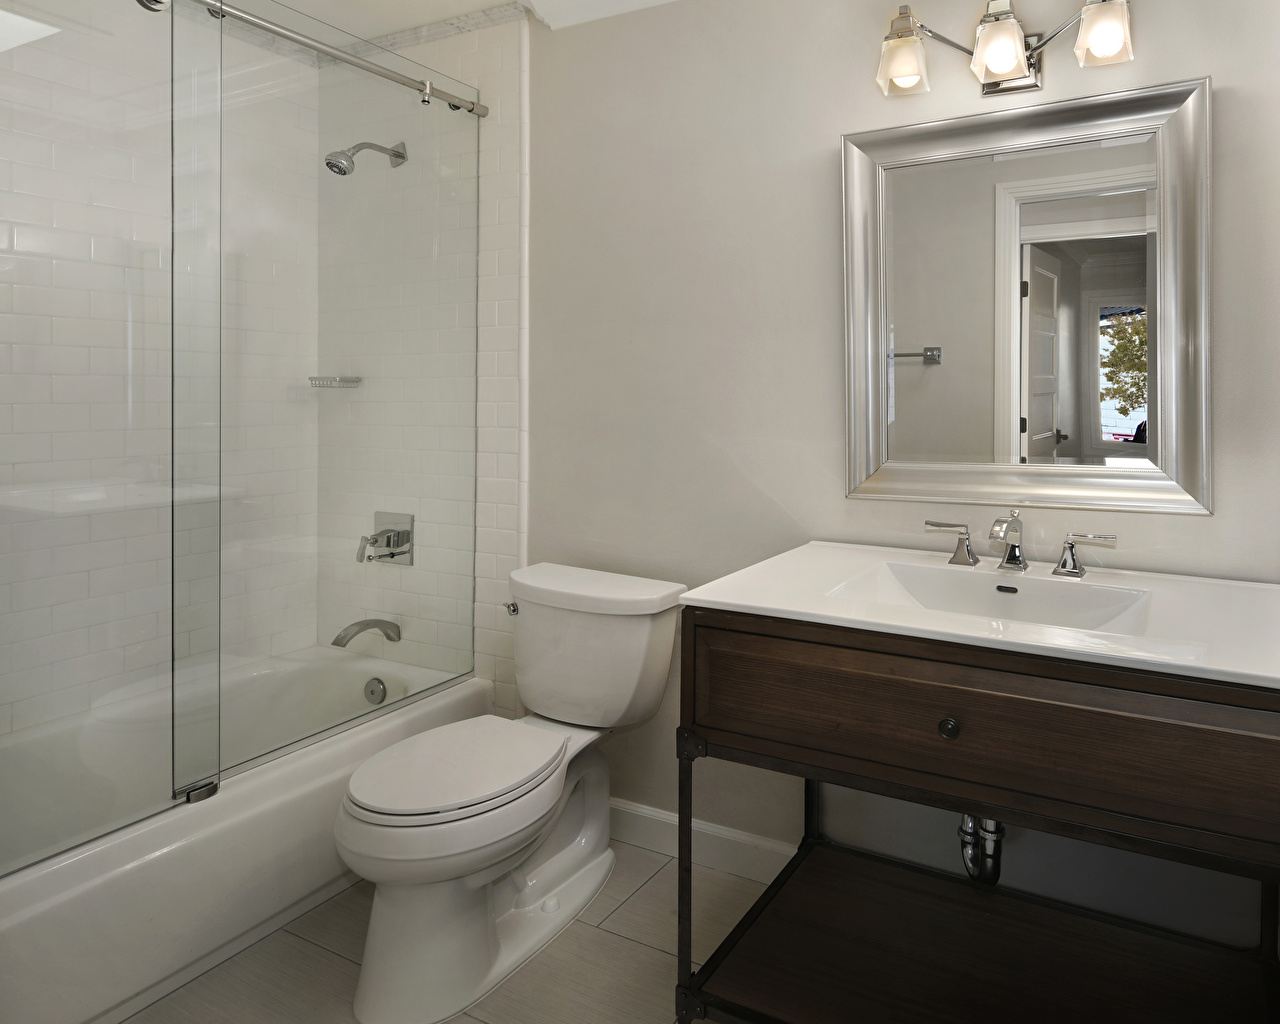 Картинка туалете Ванная Интерьер зеркала дизайна Туалет туалета туалетная комната зеркал Зеркало Дизайн